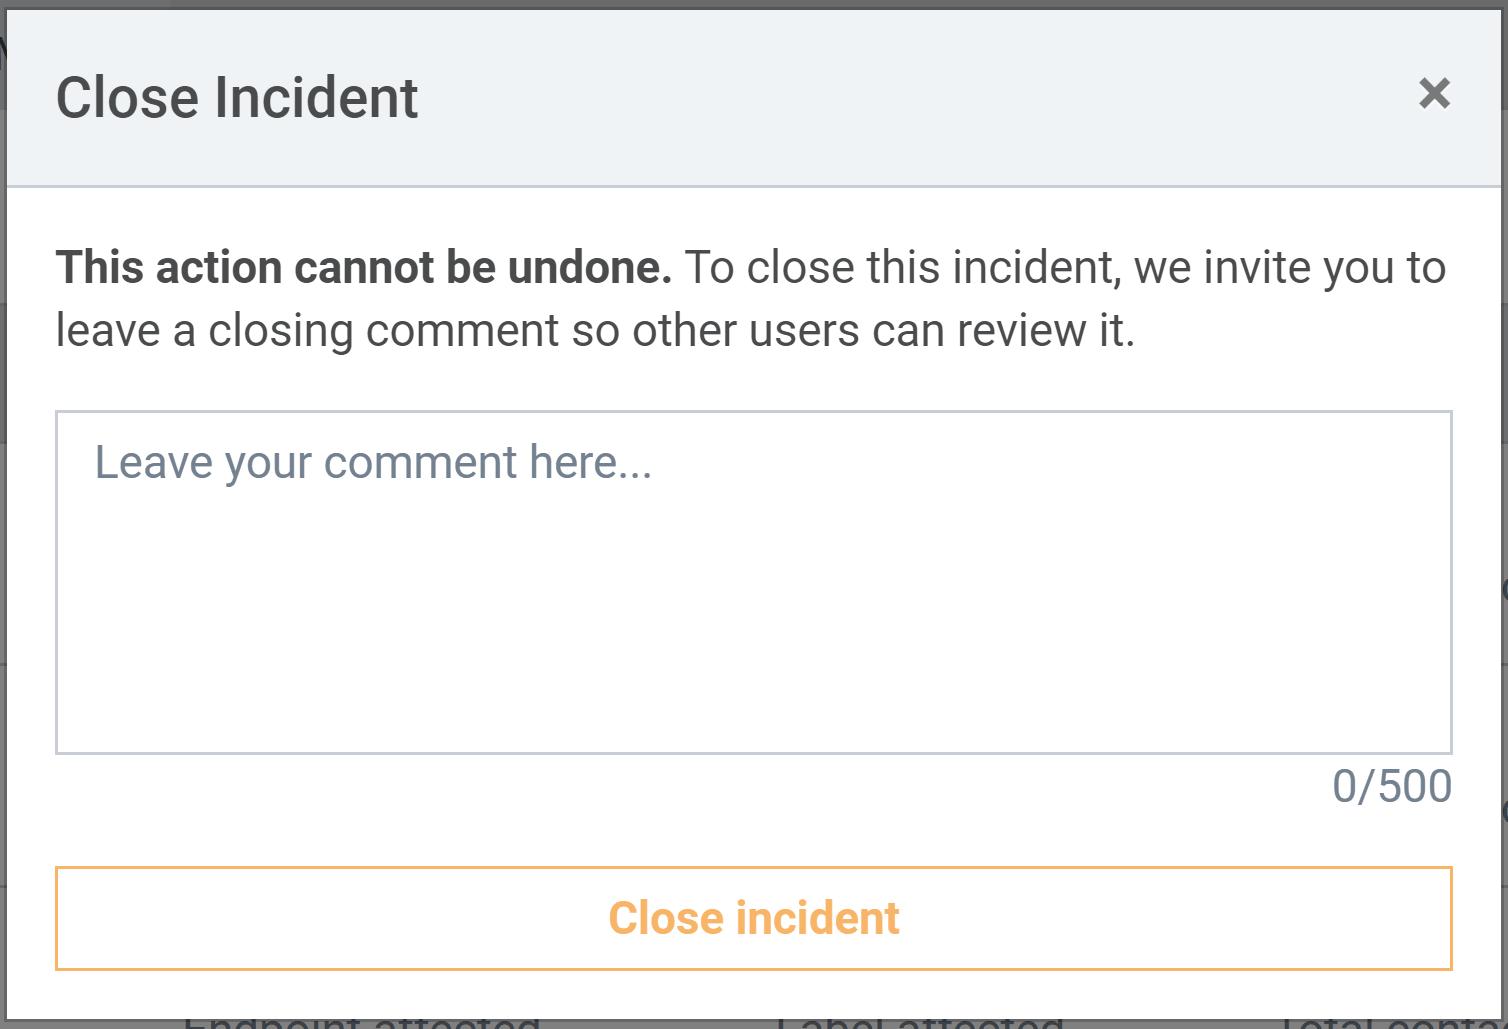 Closing an incident